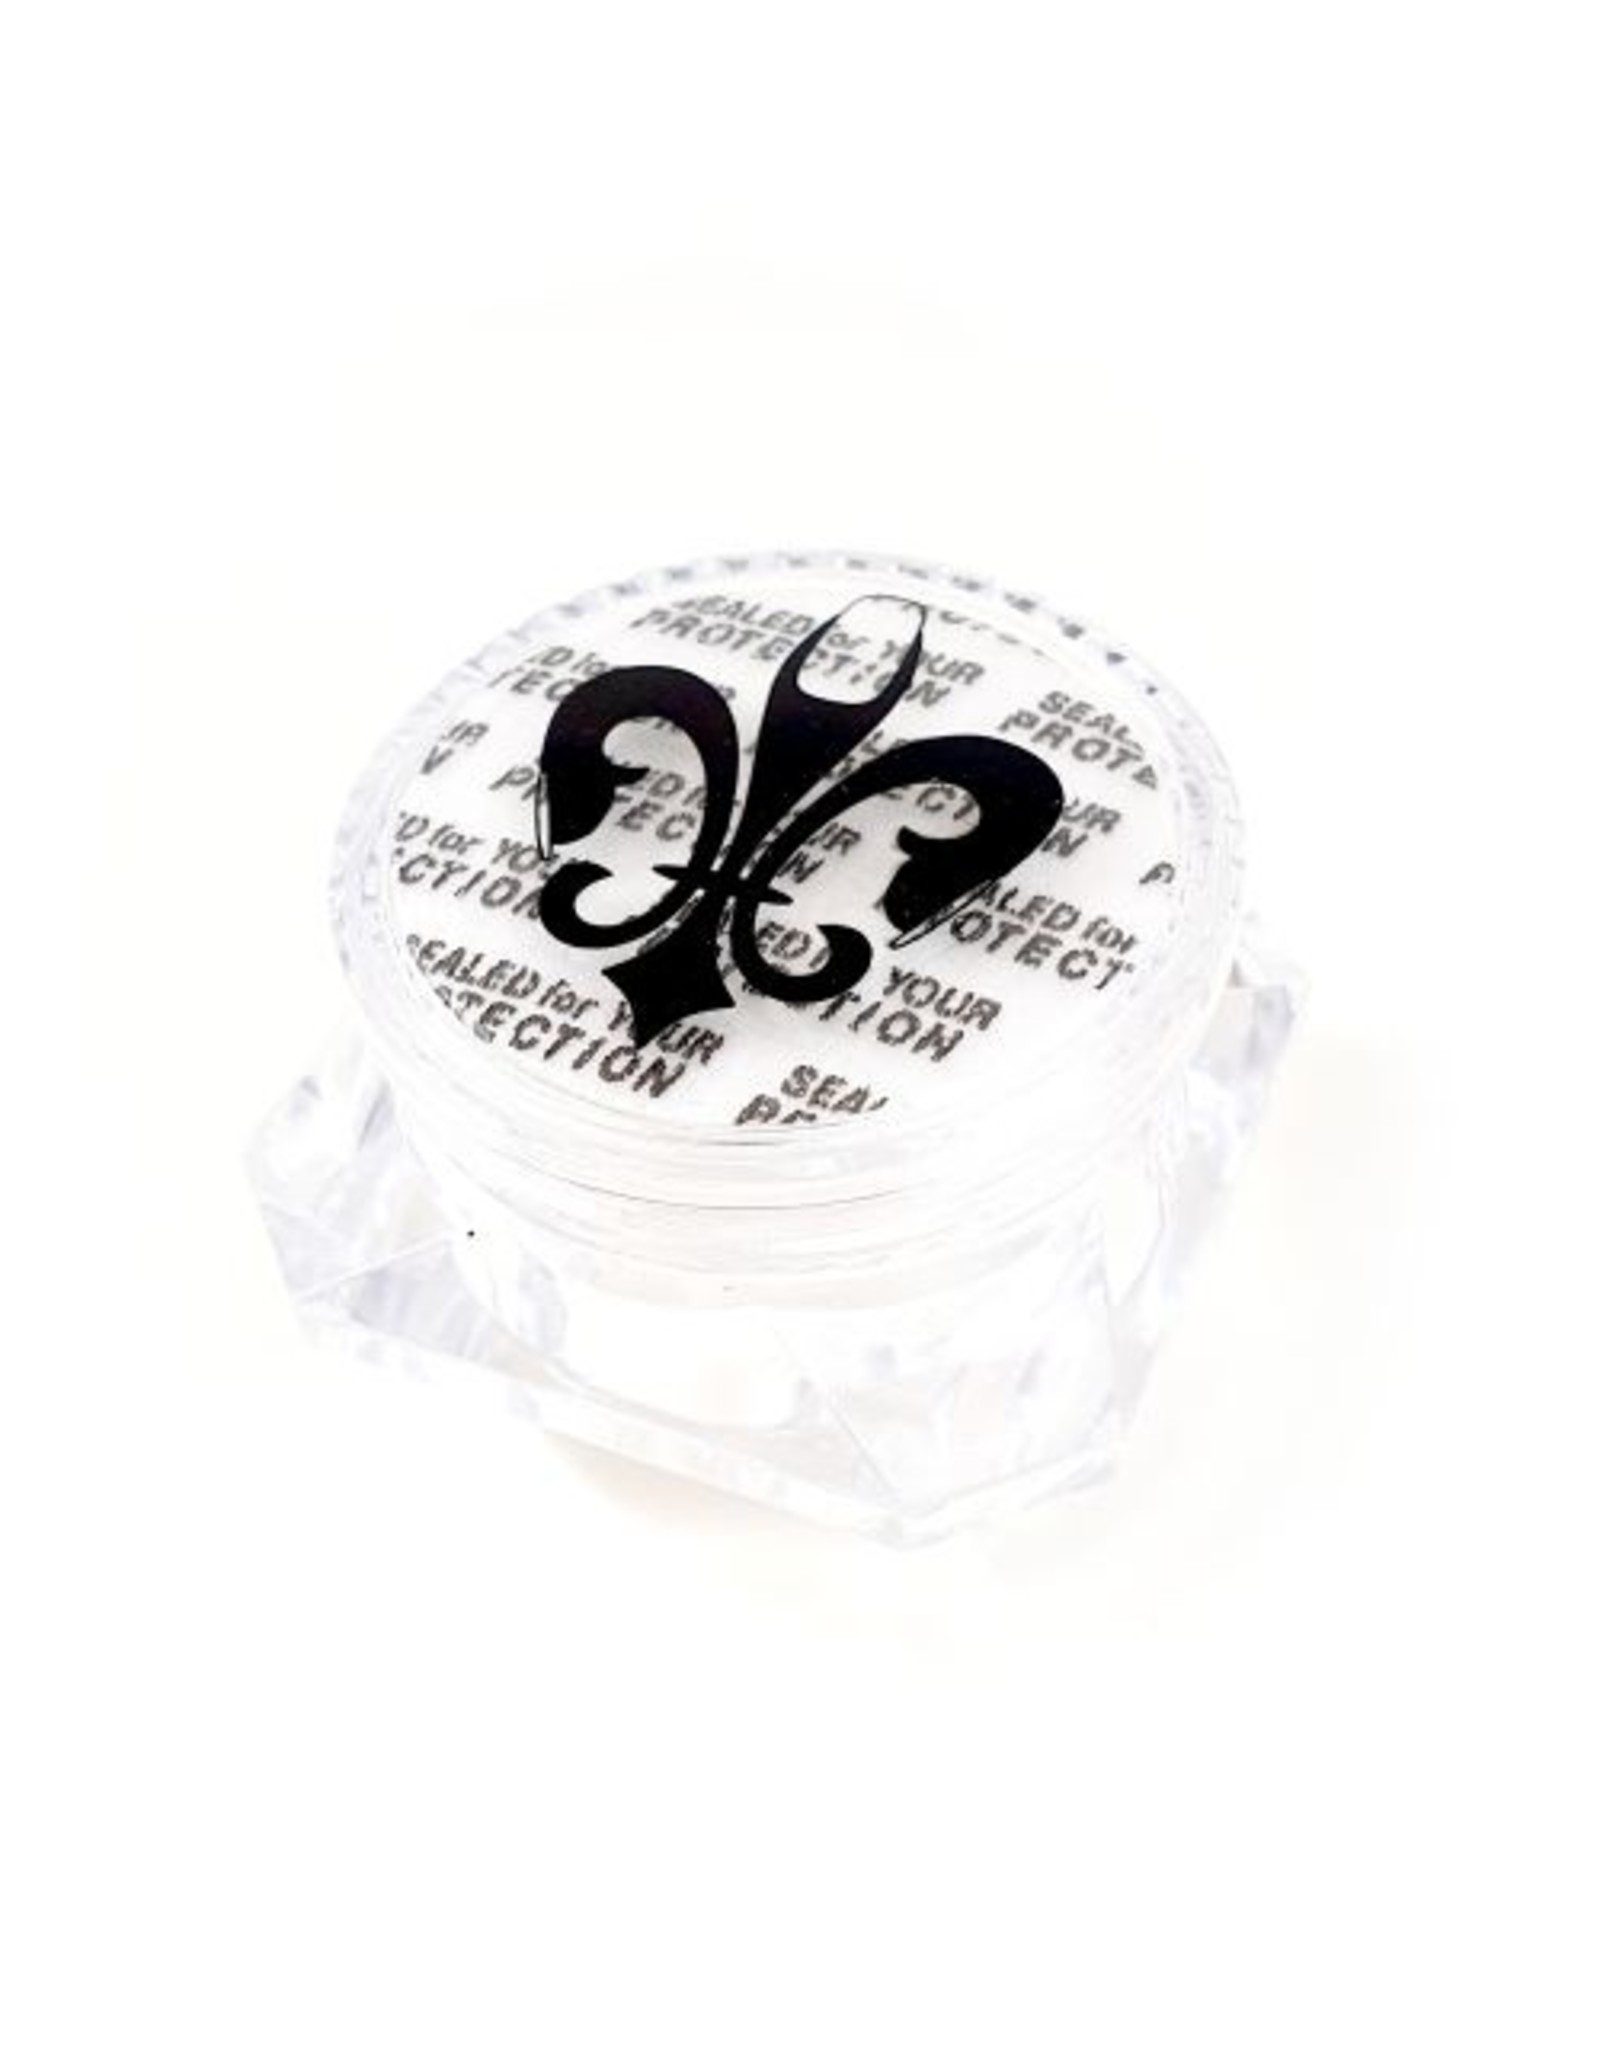 Storage, 6 Diamond Lilly Nails jars